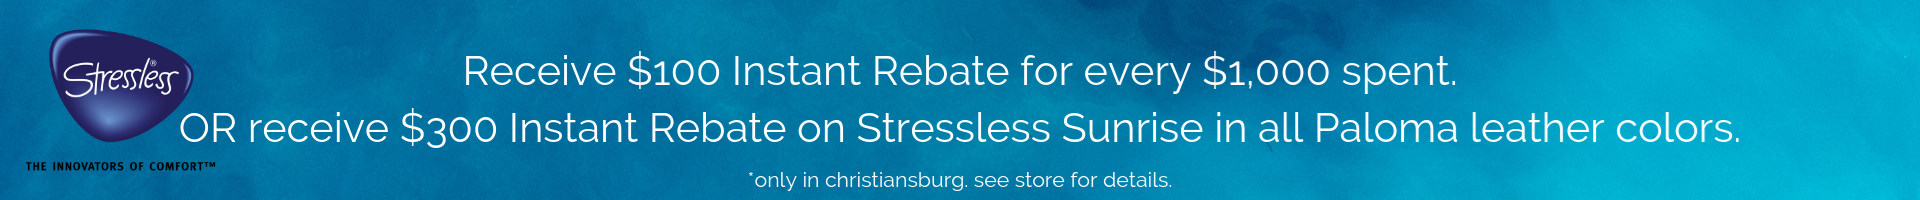 stressless p3